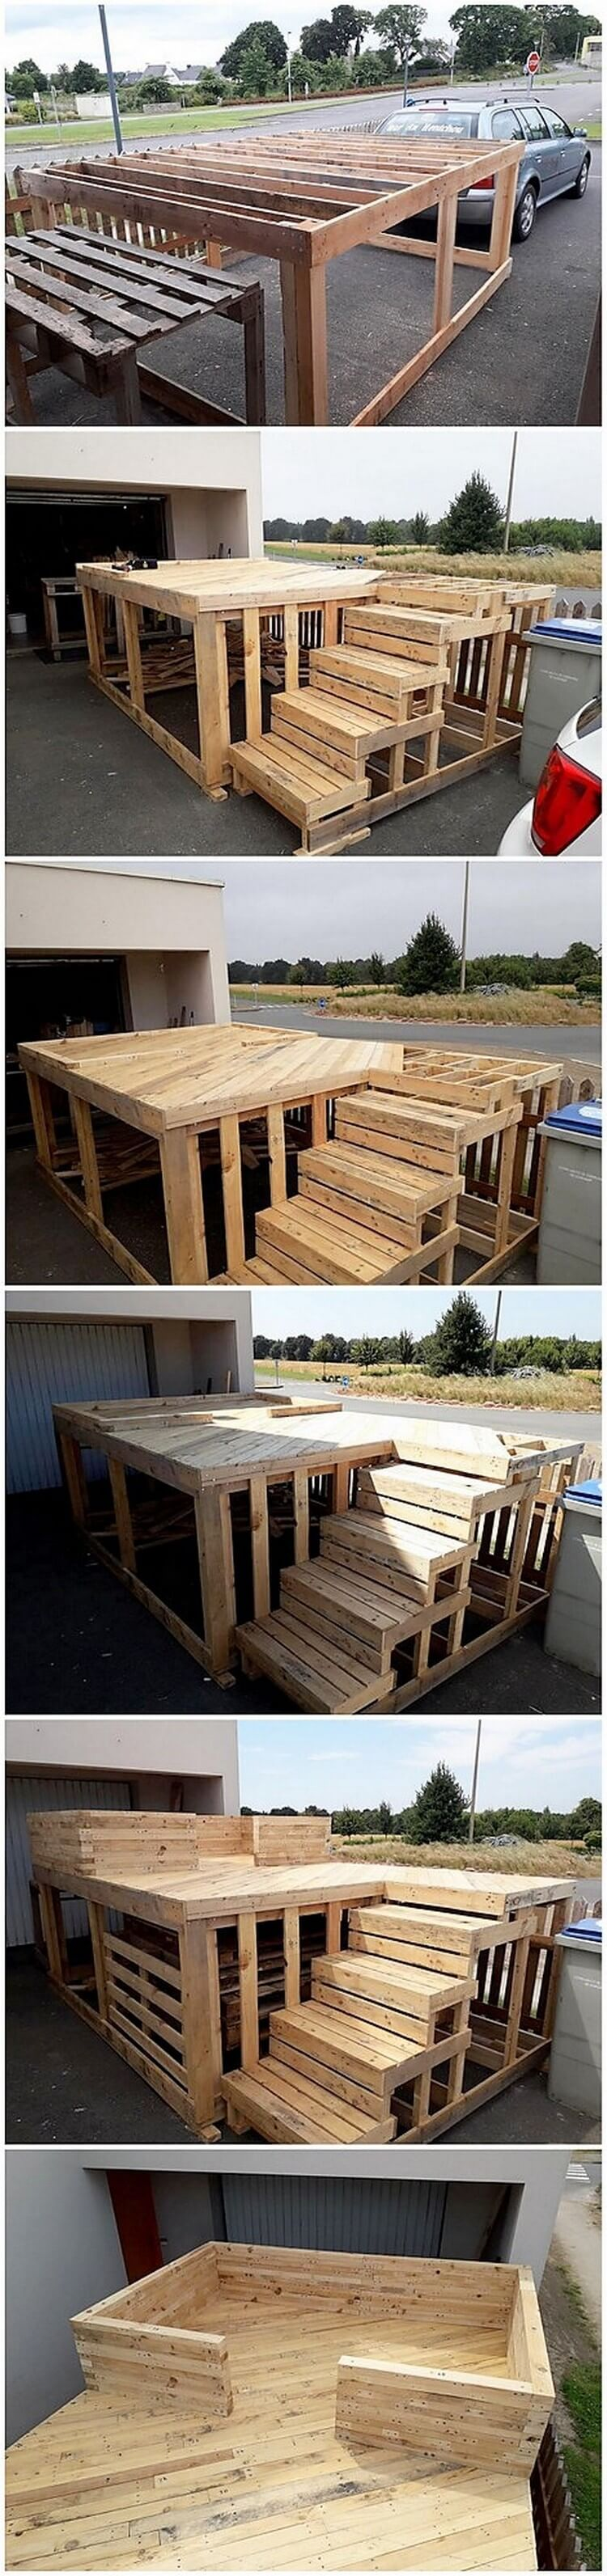 DIY Pallet Creation